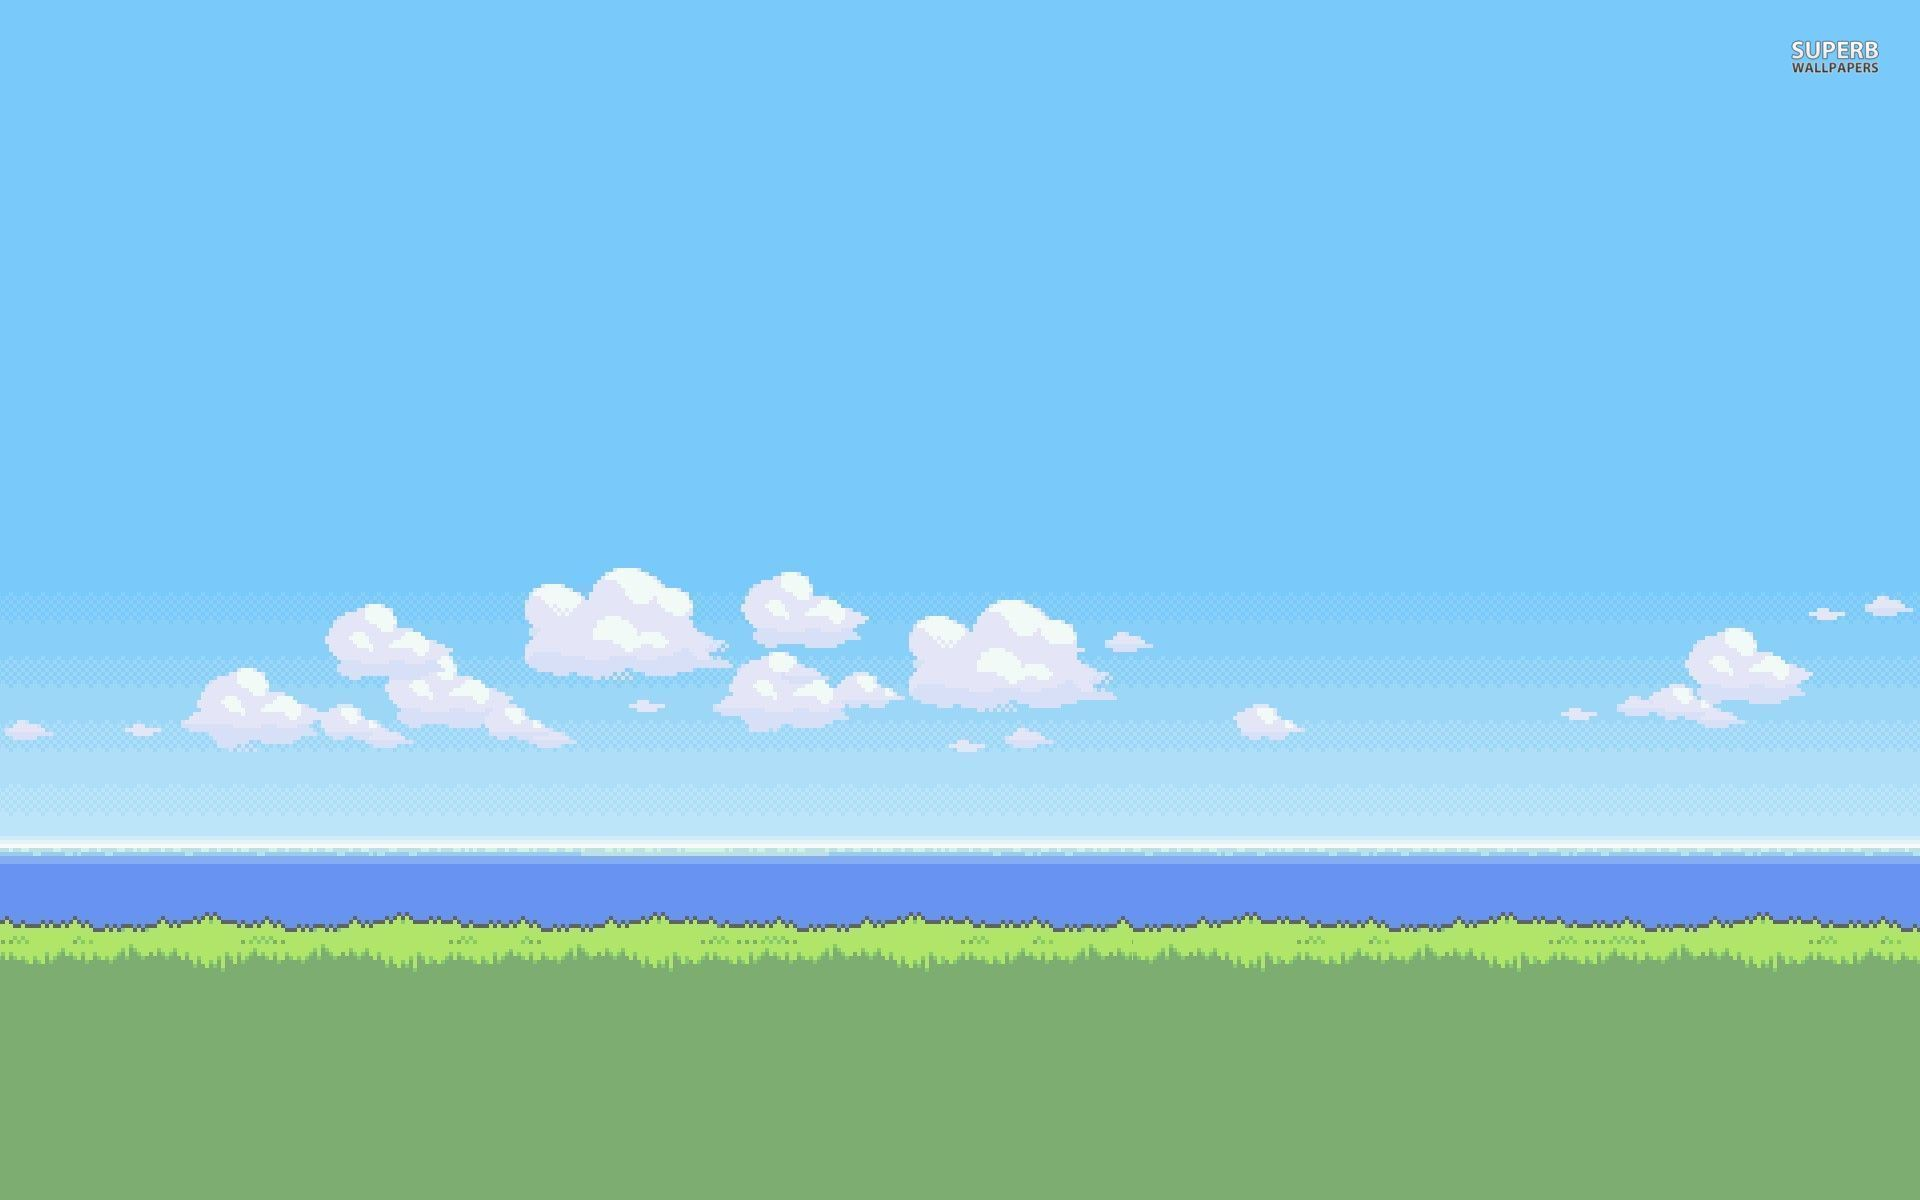 Hd Bit Backgrounds Pixel Art Art Wallpaper Landscape Artwork